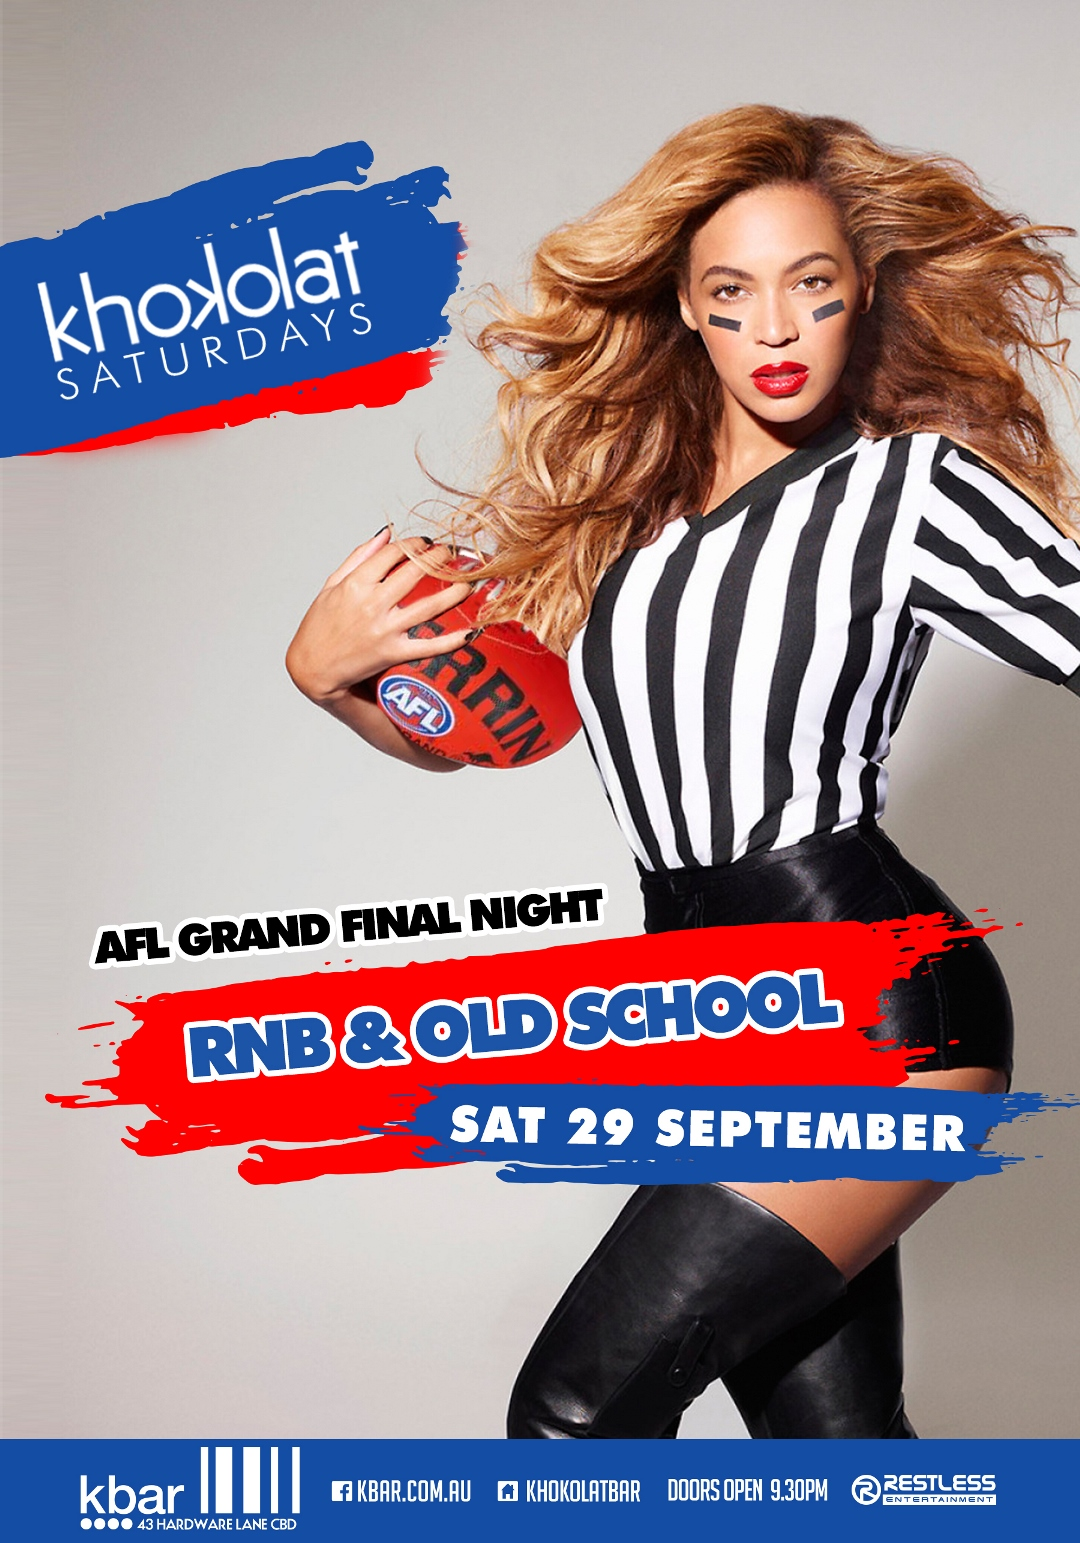 Khokolat Saturdays – AFL Grand Final Night